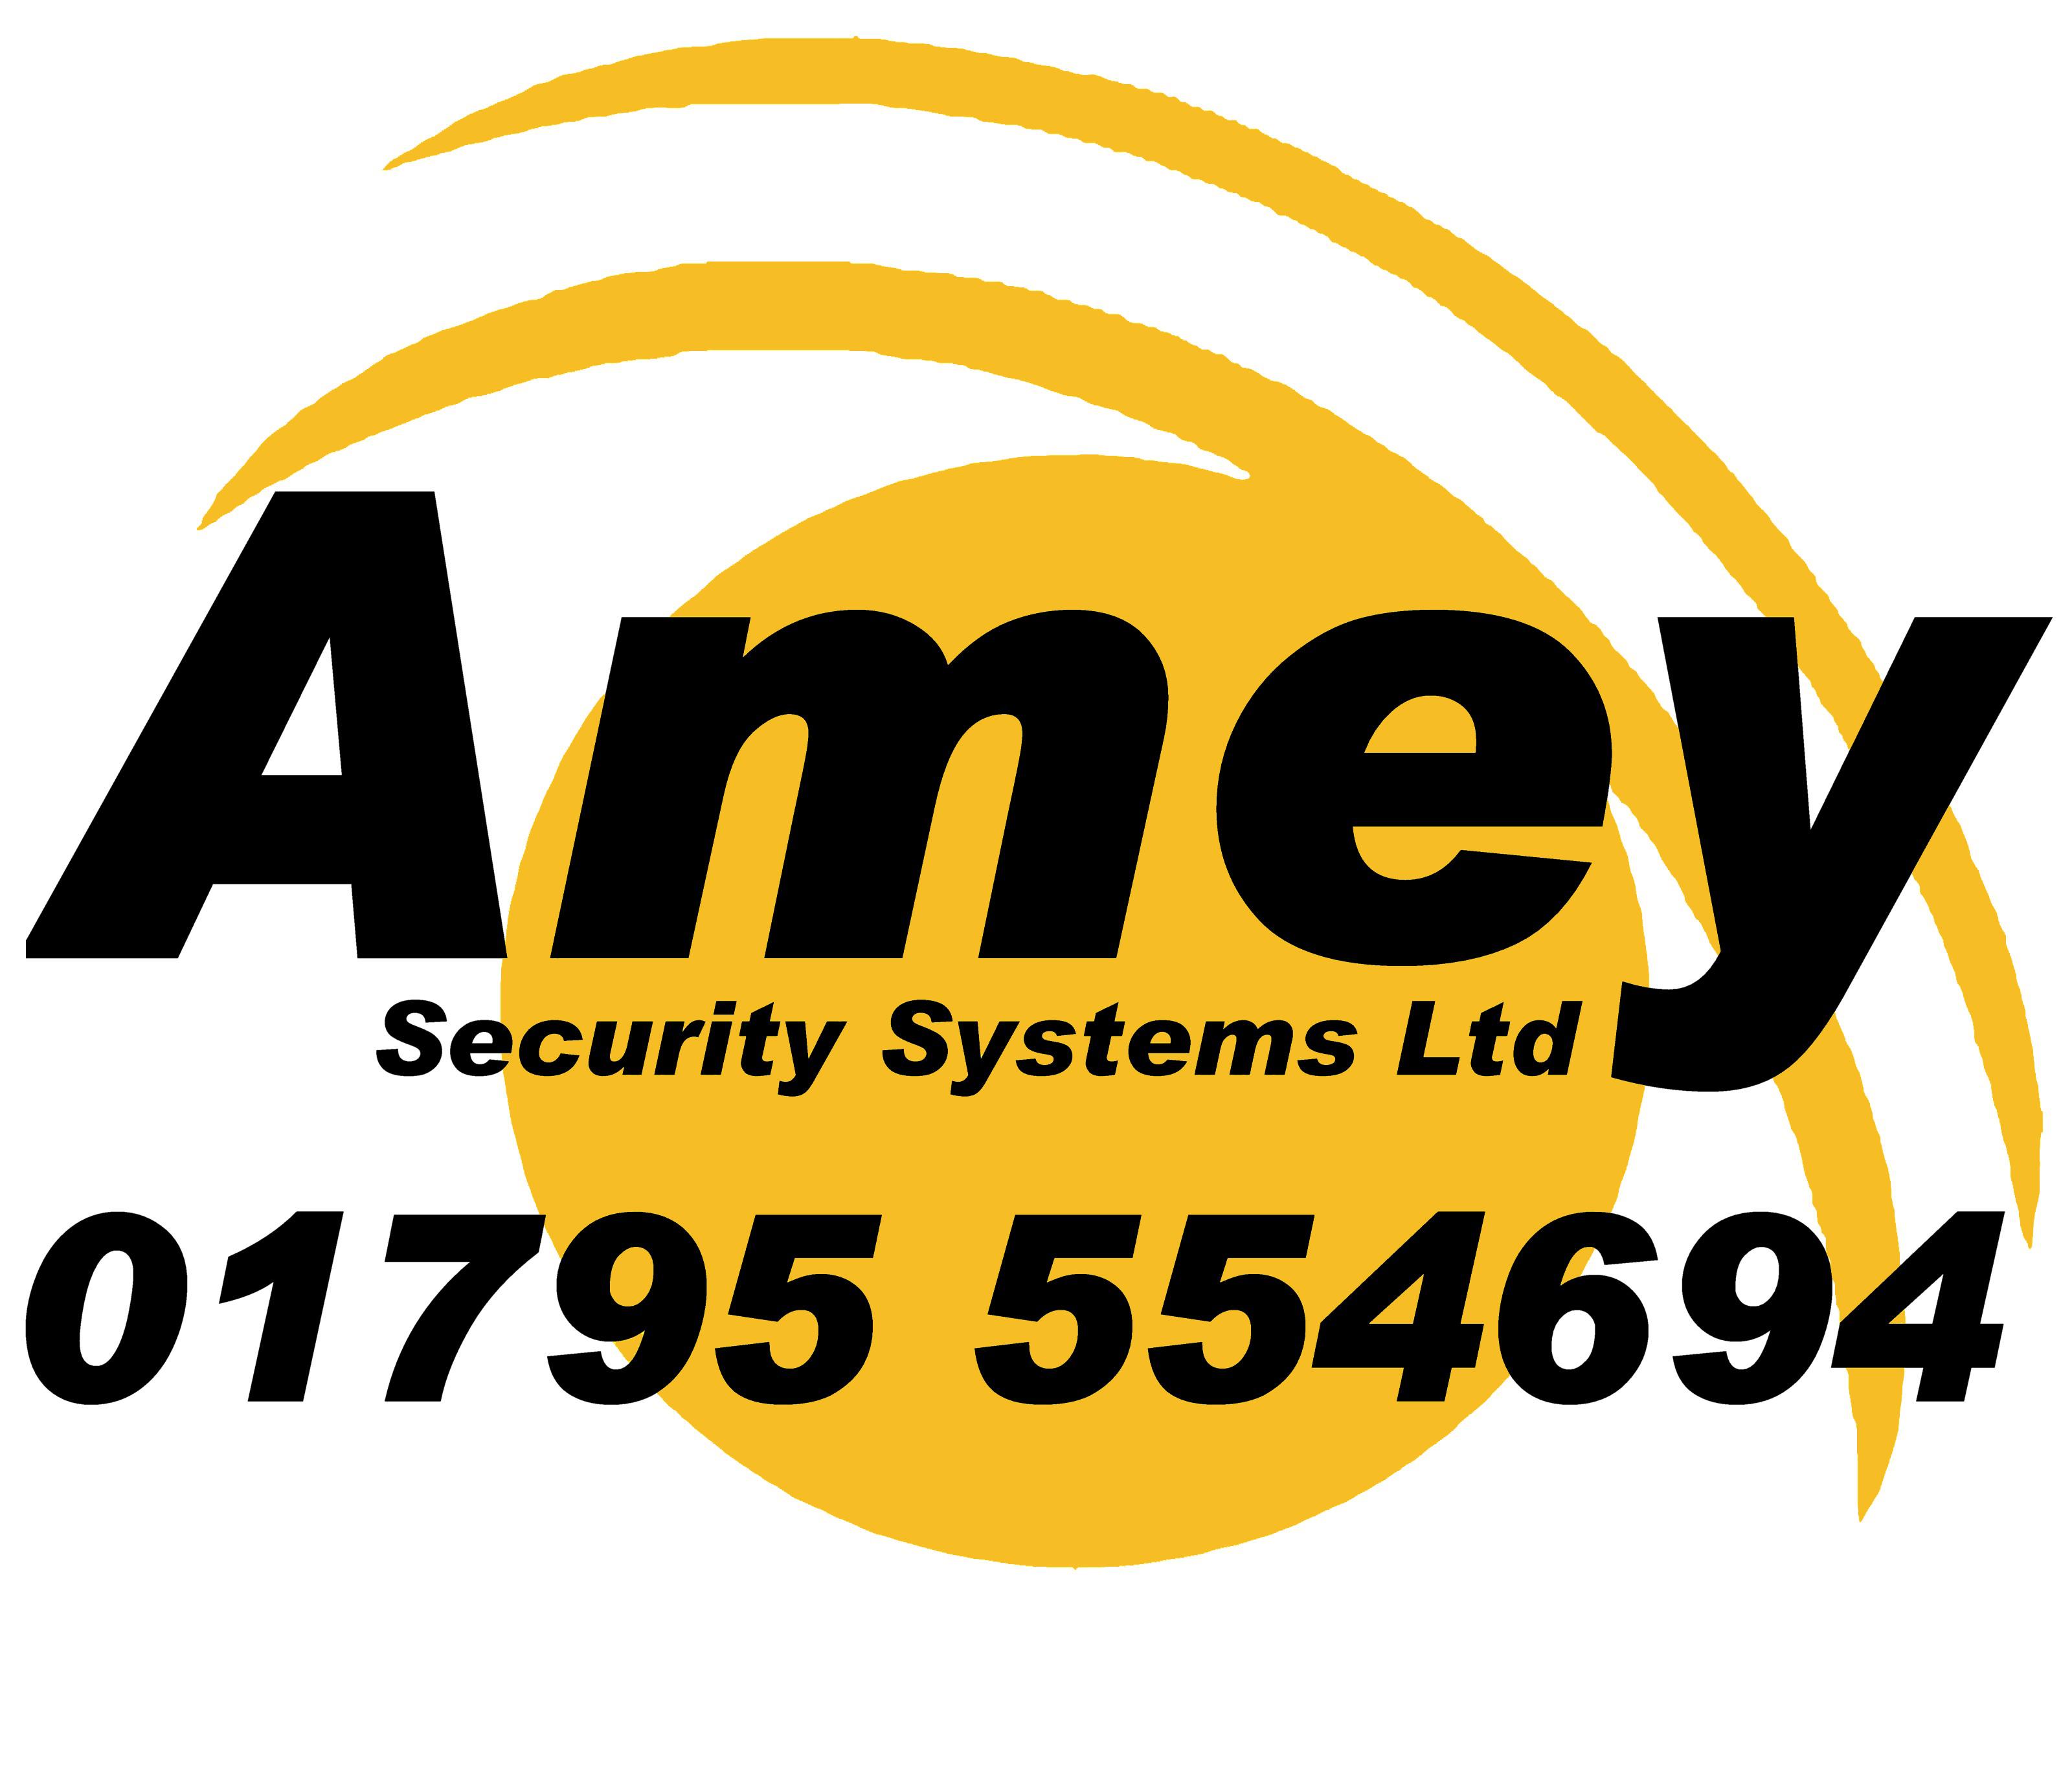 Alarm Kent trading standards approved